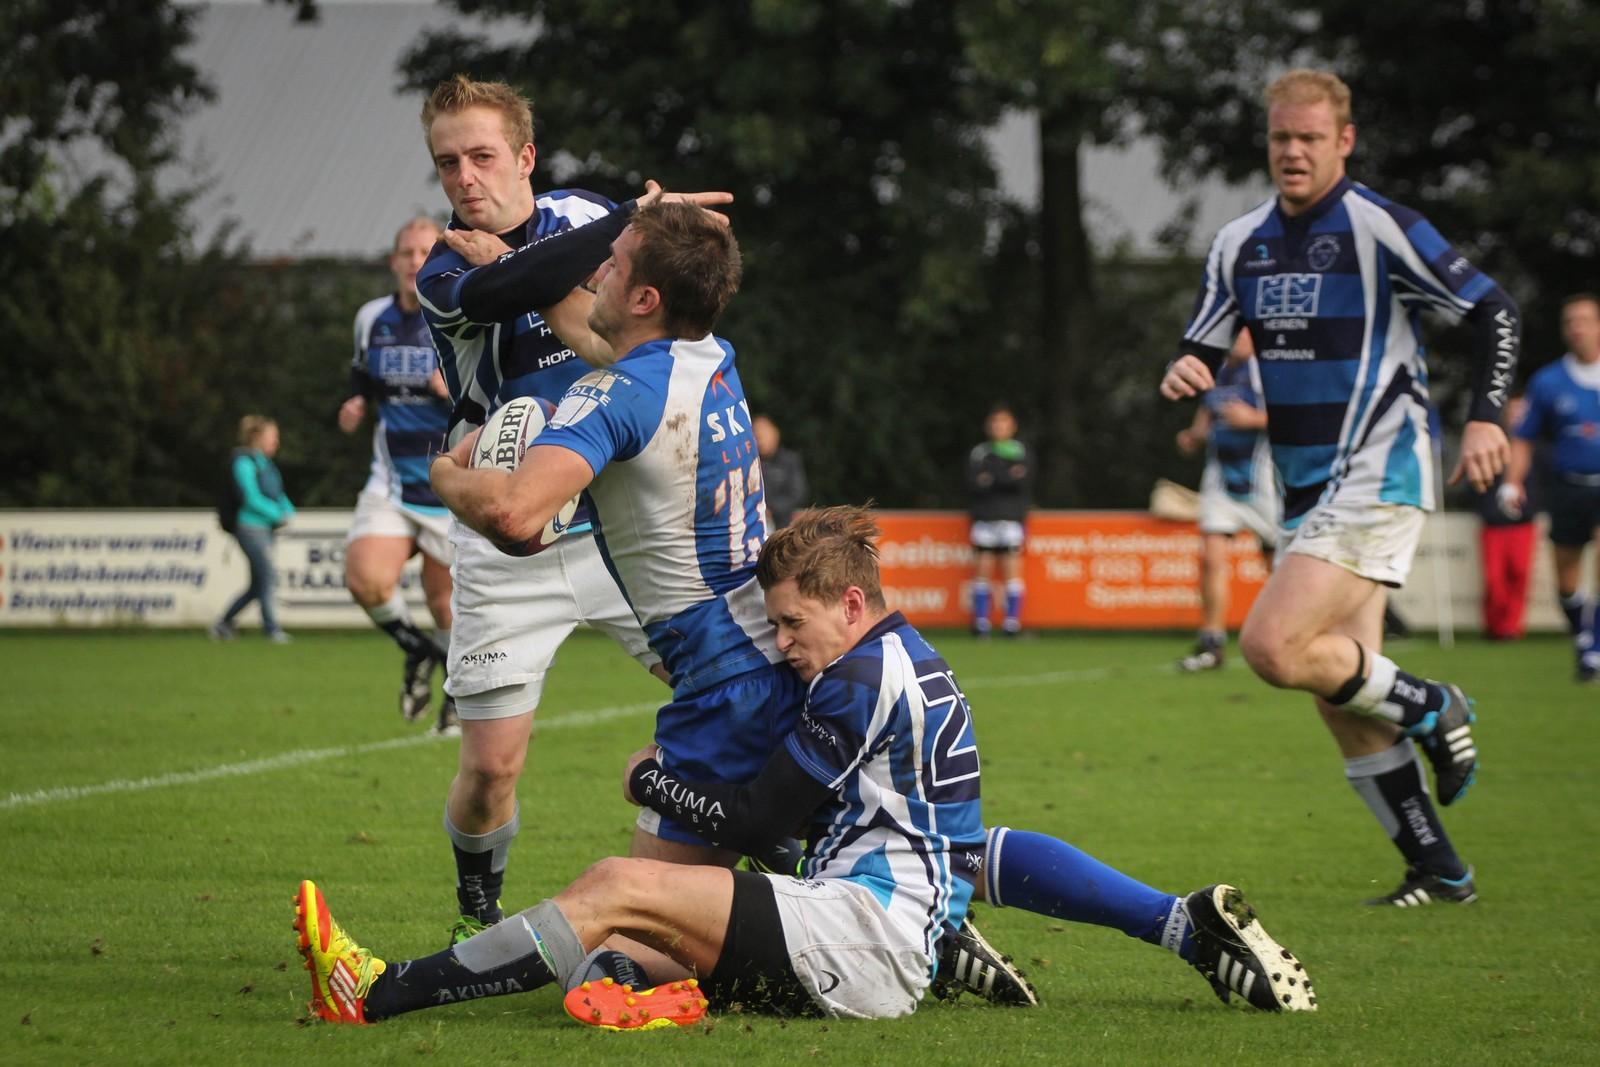 2013-10-12 | RCS – Zwolle | 20-14